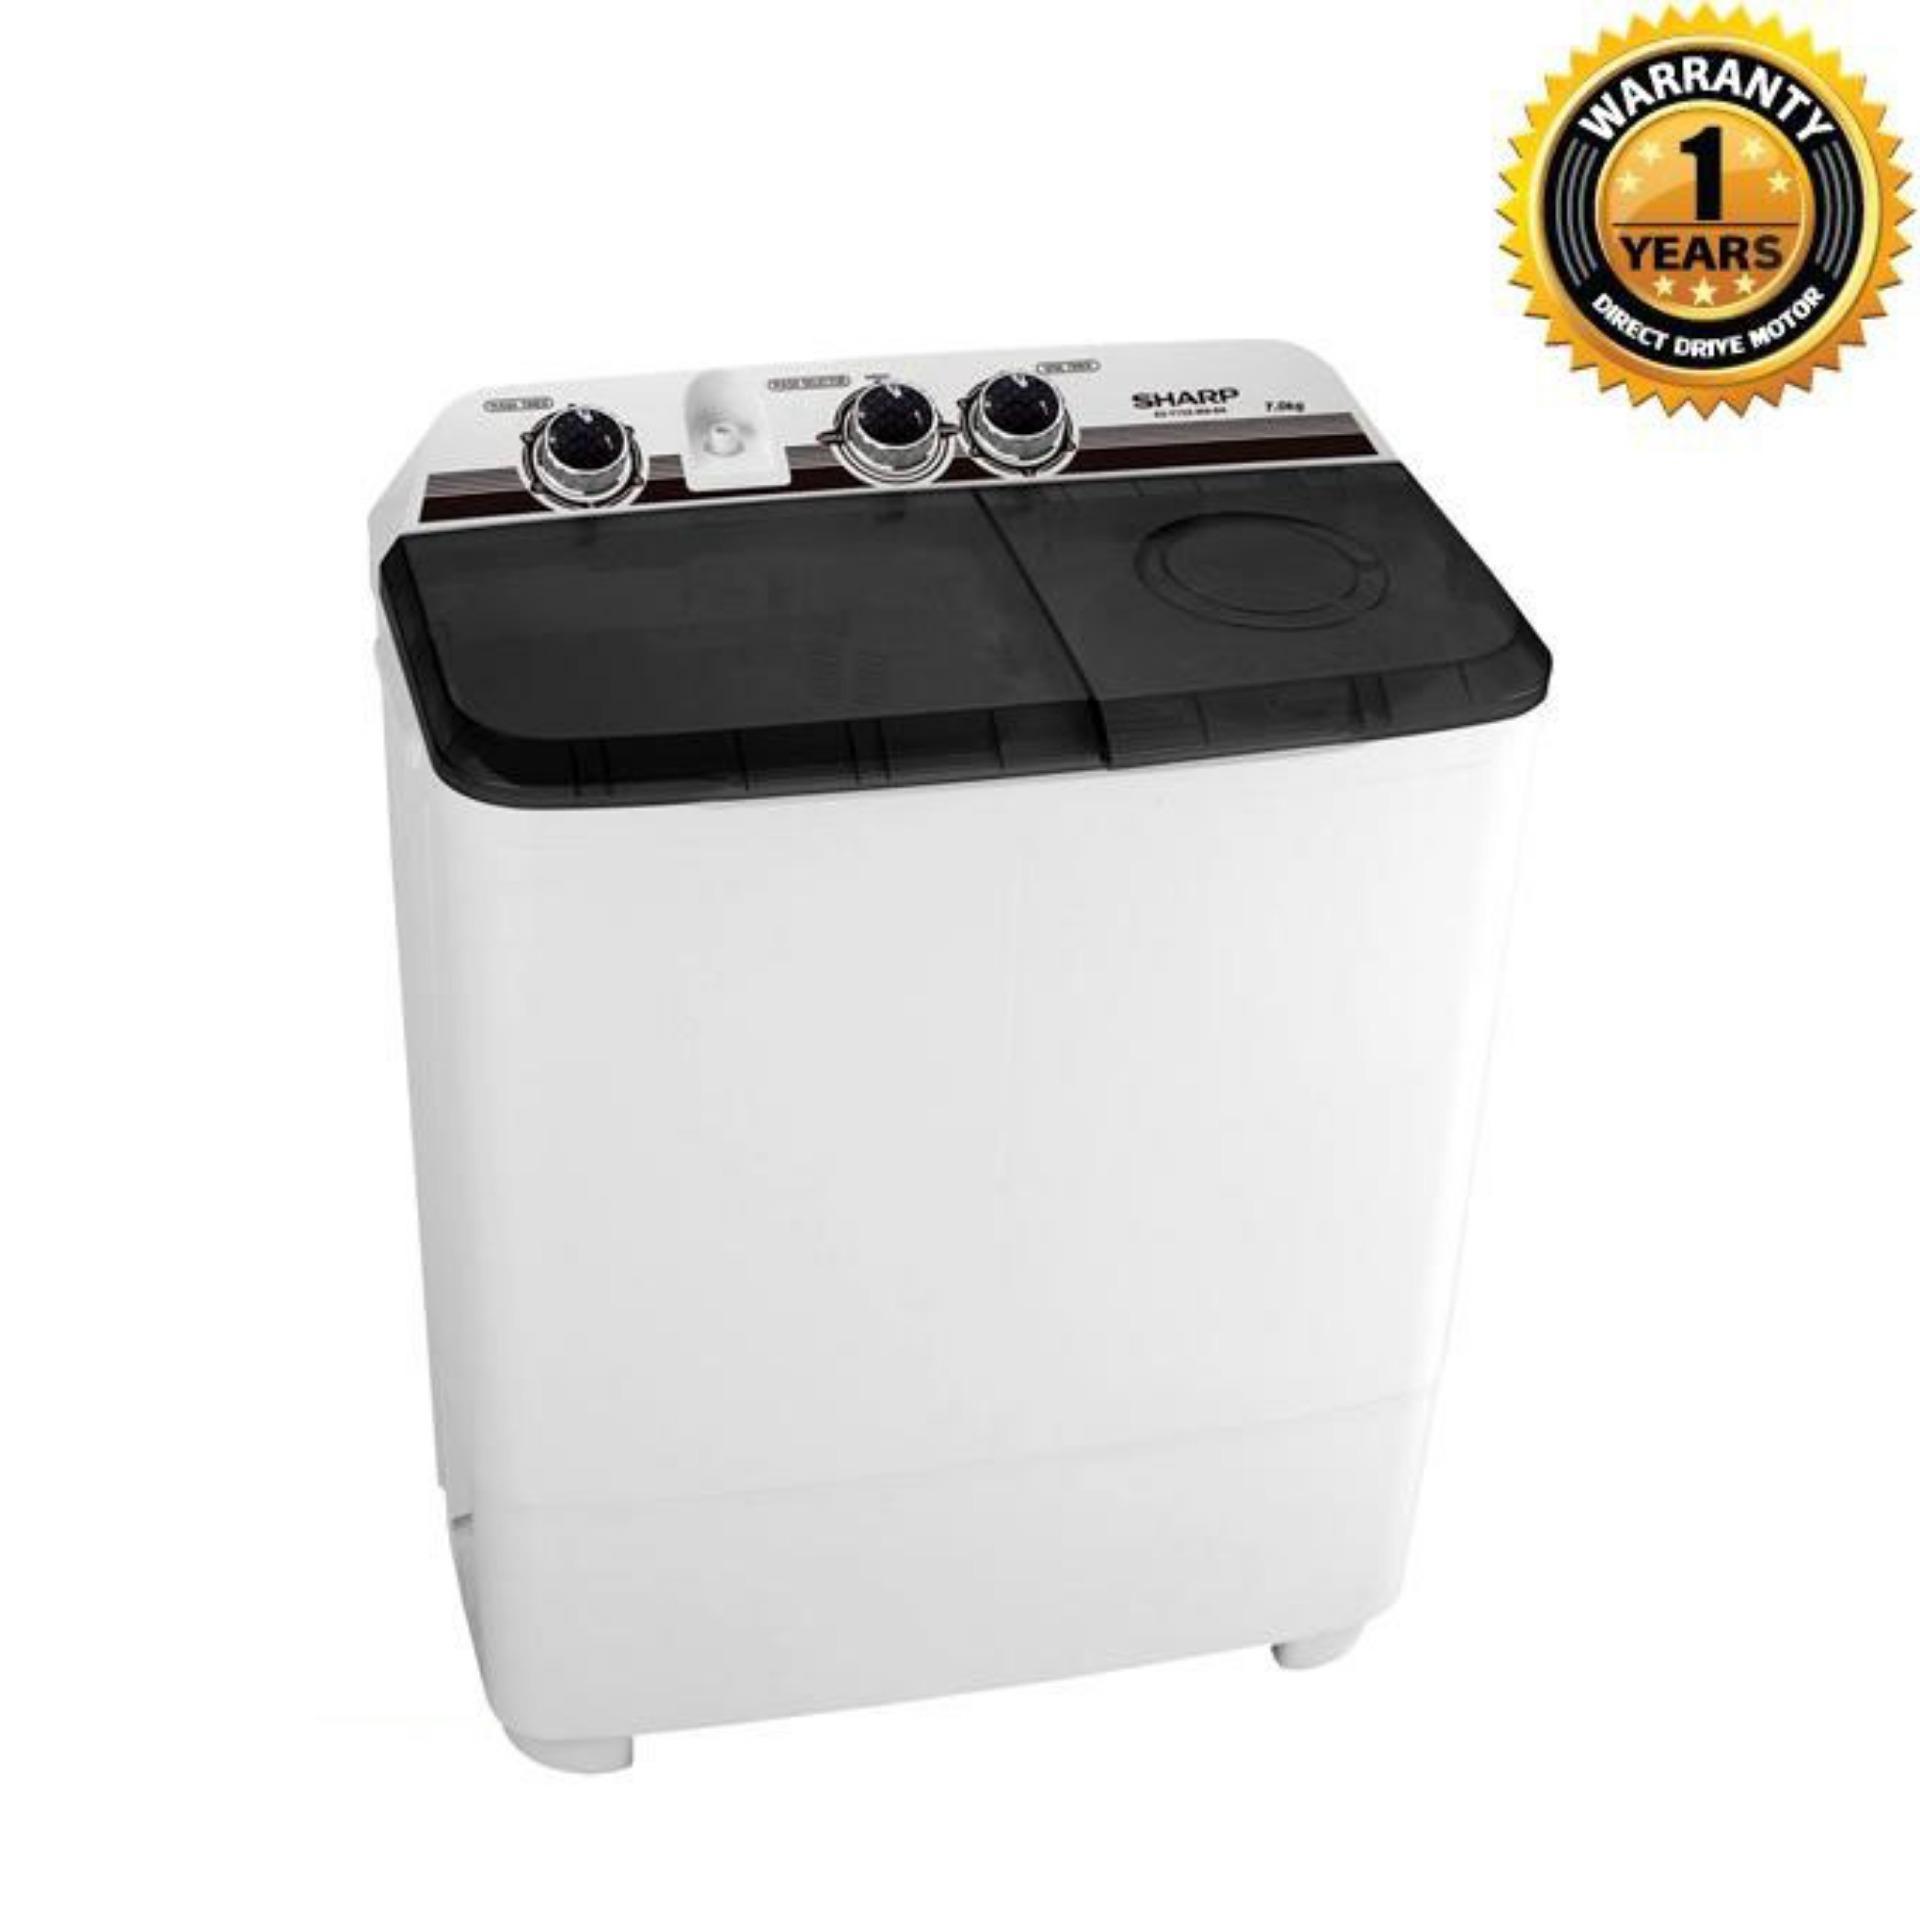 ES-T75X-WN - Manual Washing Machine - 7 KG - White